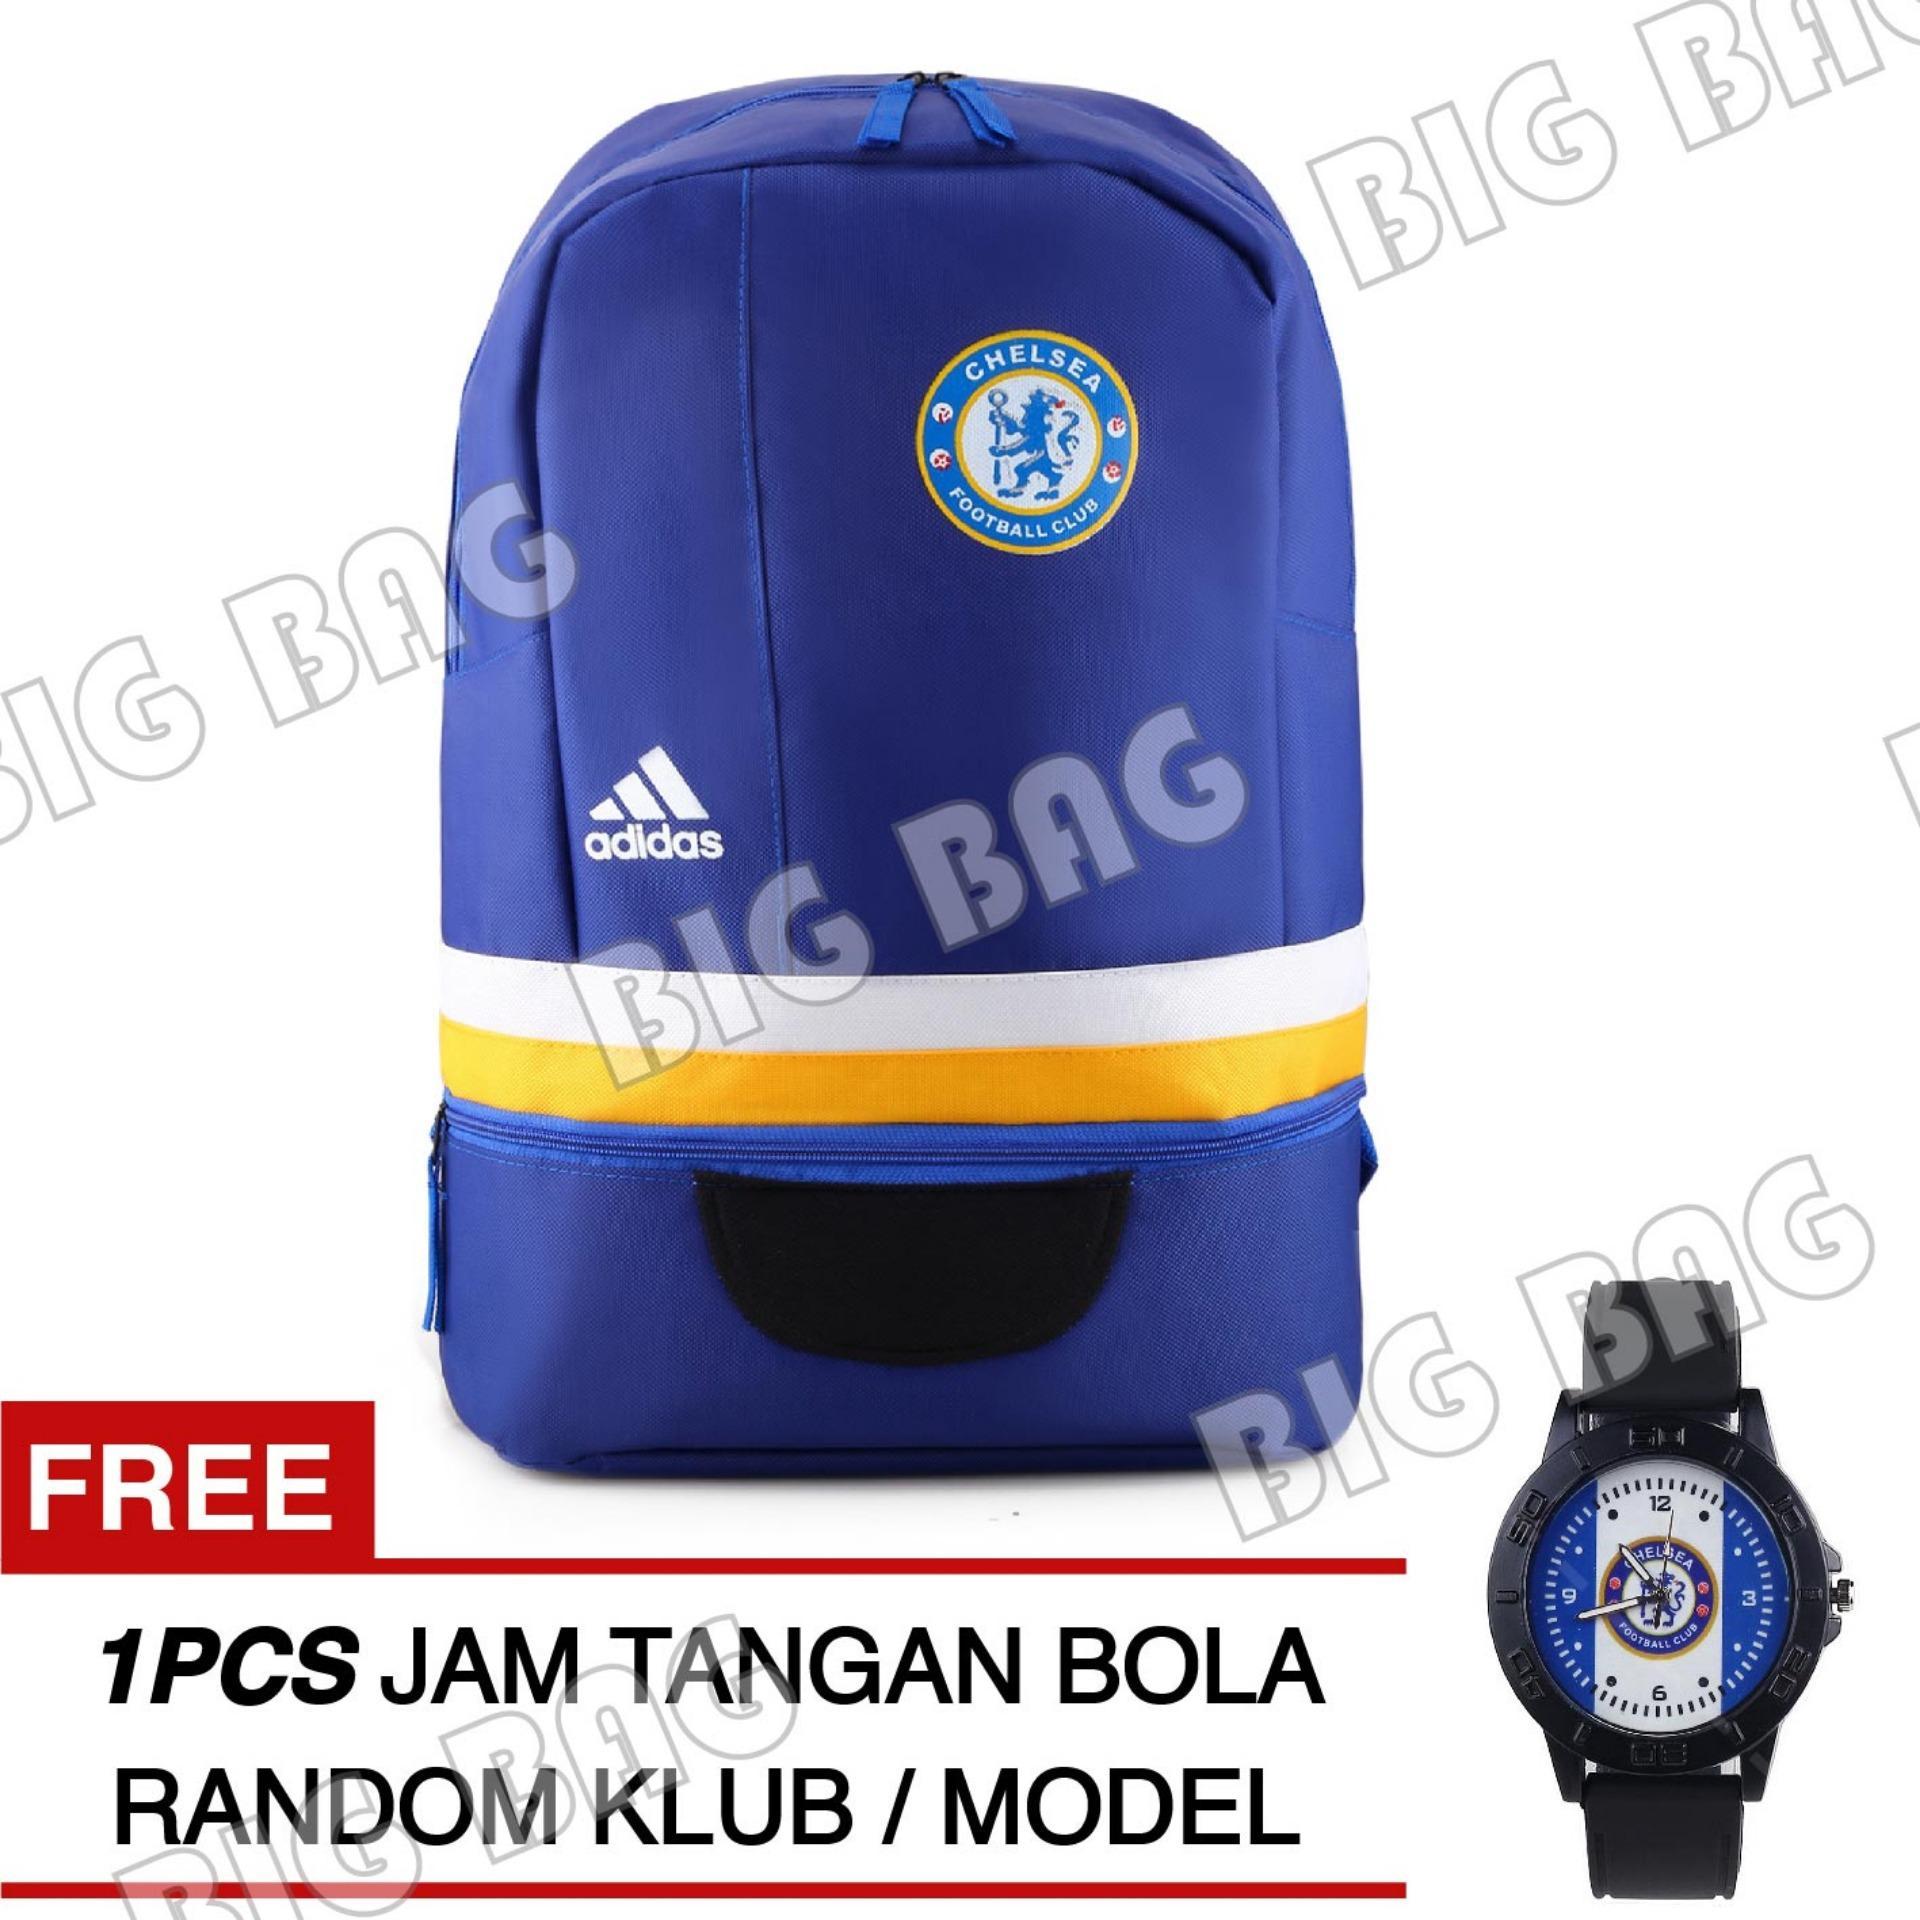 Tas Ransel Adidas Bola Pria Chelsea FC Laptop Backpack Men Soccer Editions - Blue + Raincover + FREE Jam Tangan Pria Random Color / Model